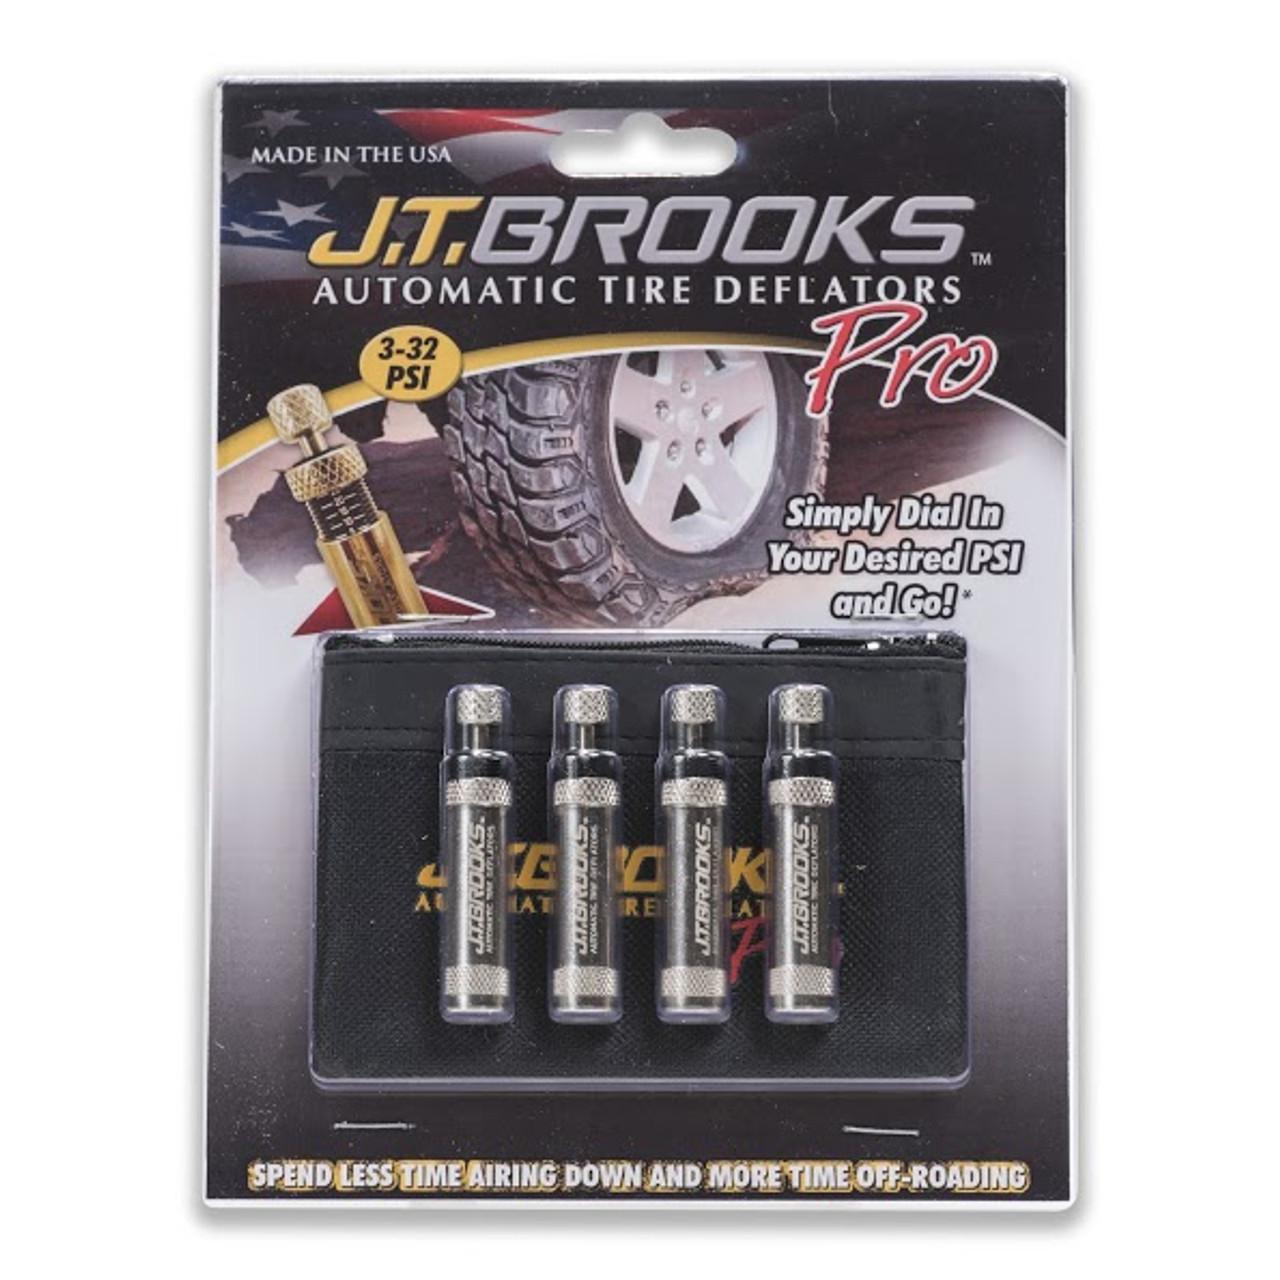 JT Brooks ATDP4 Automatic Tire Deflator Pro Set of 4